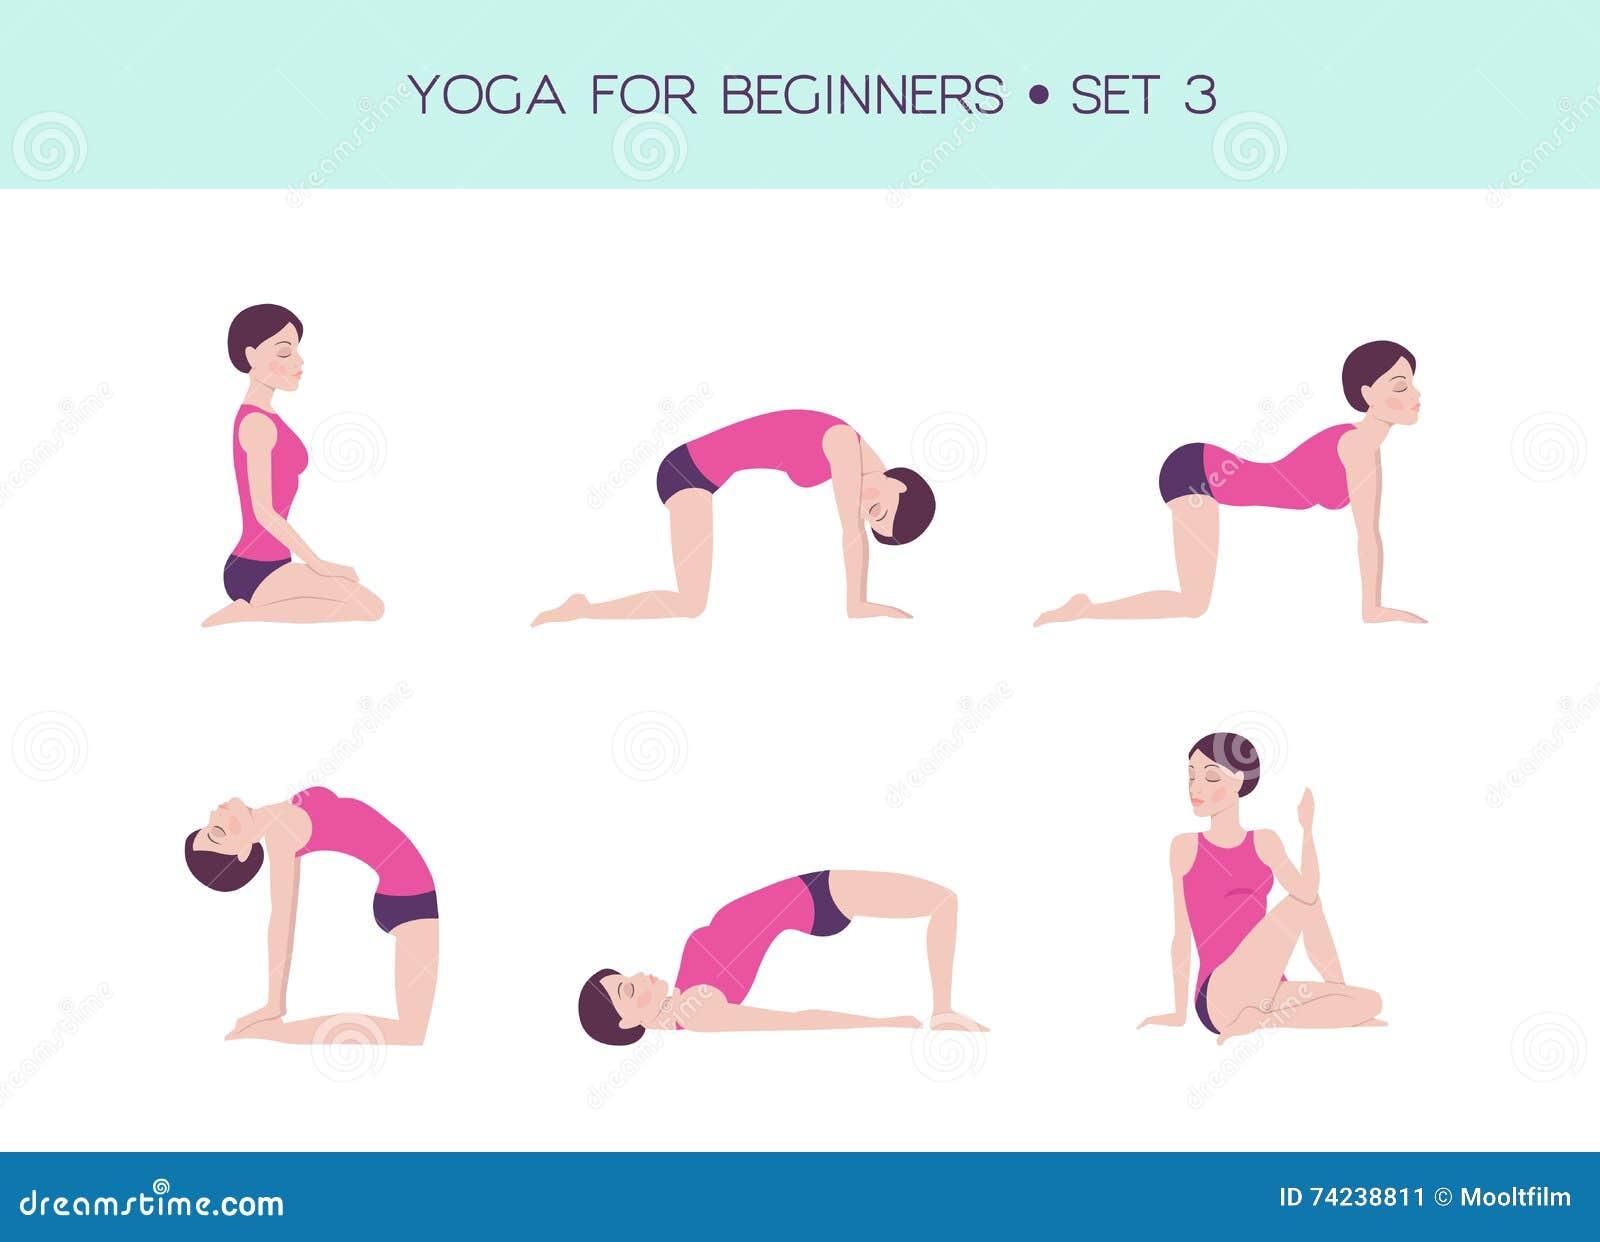 Yoga For Beginners Basic Set Figure Flexible